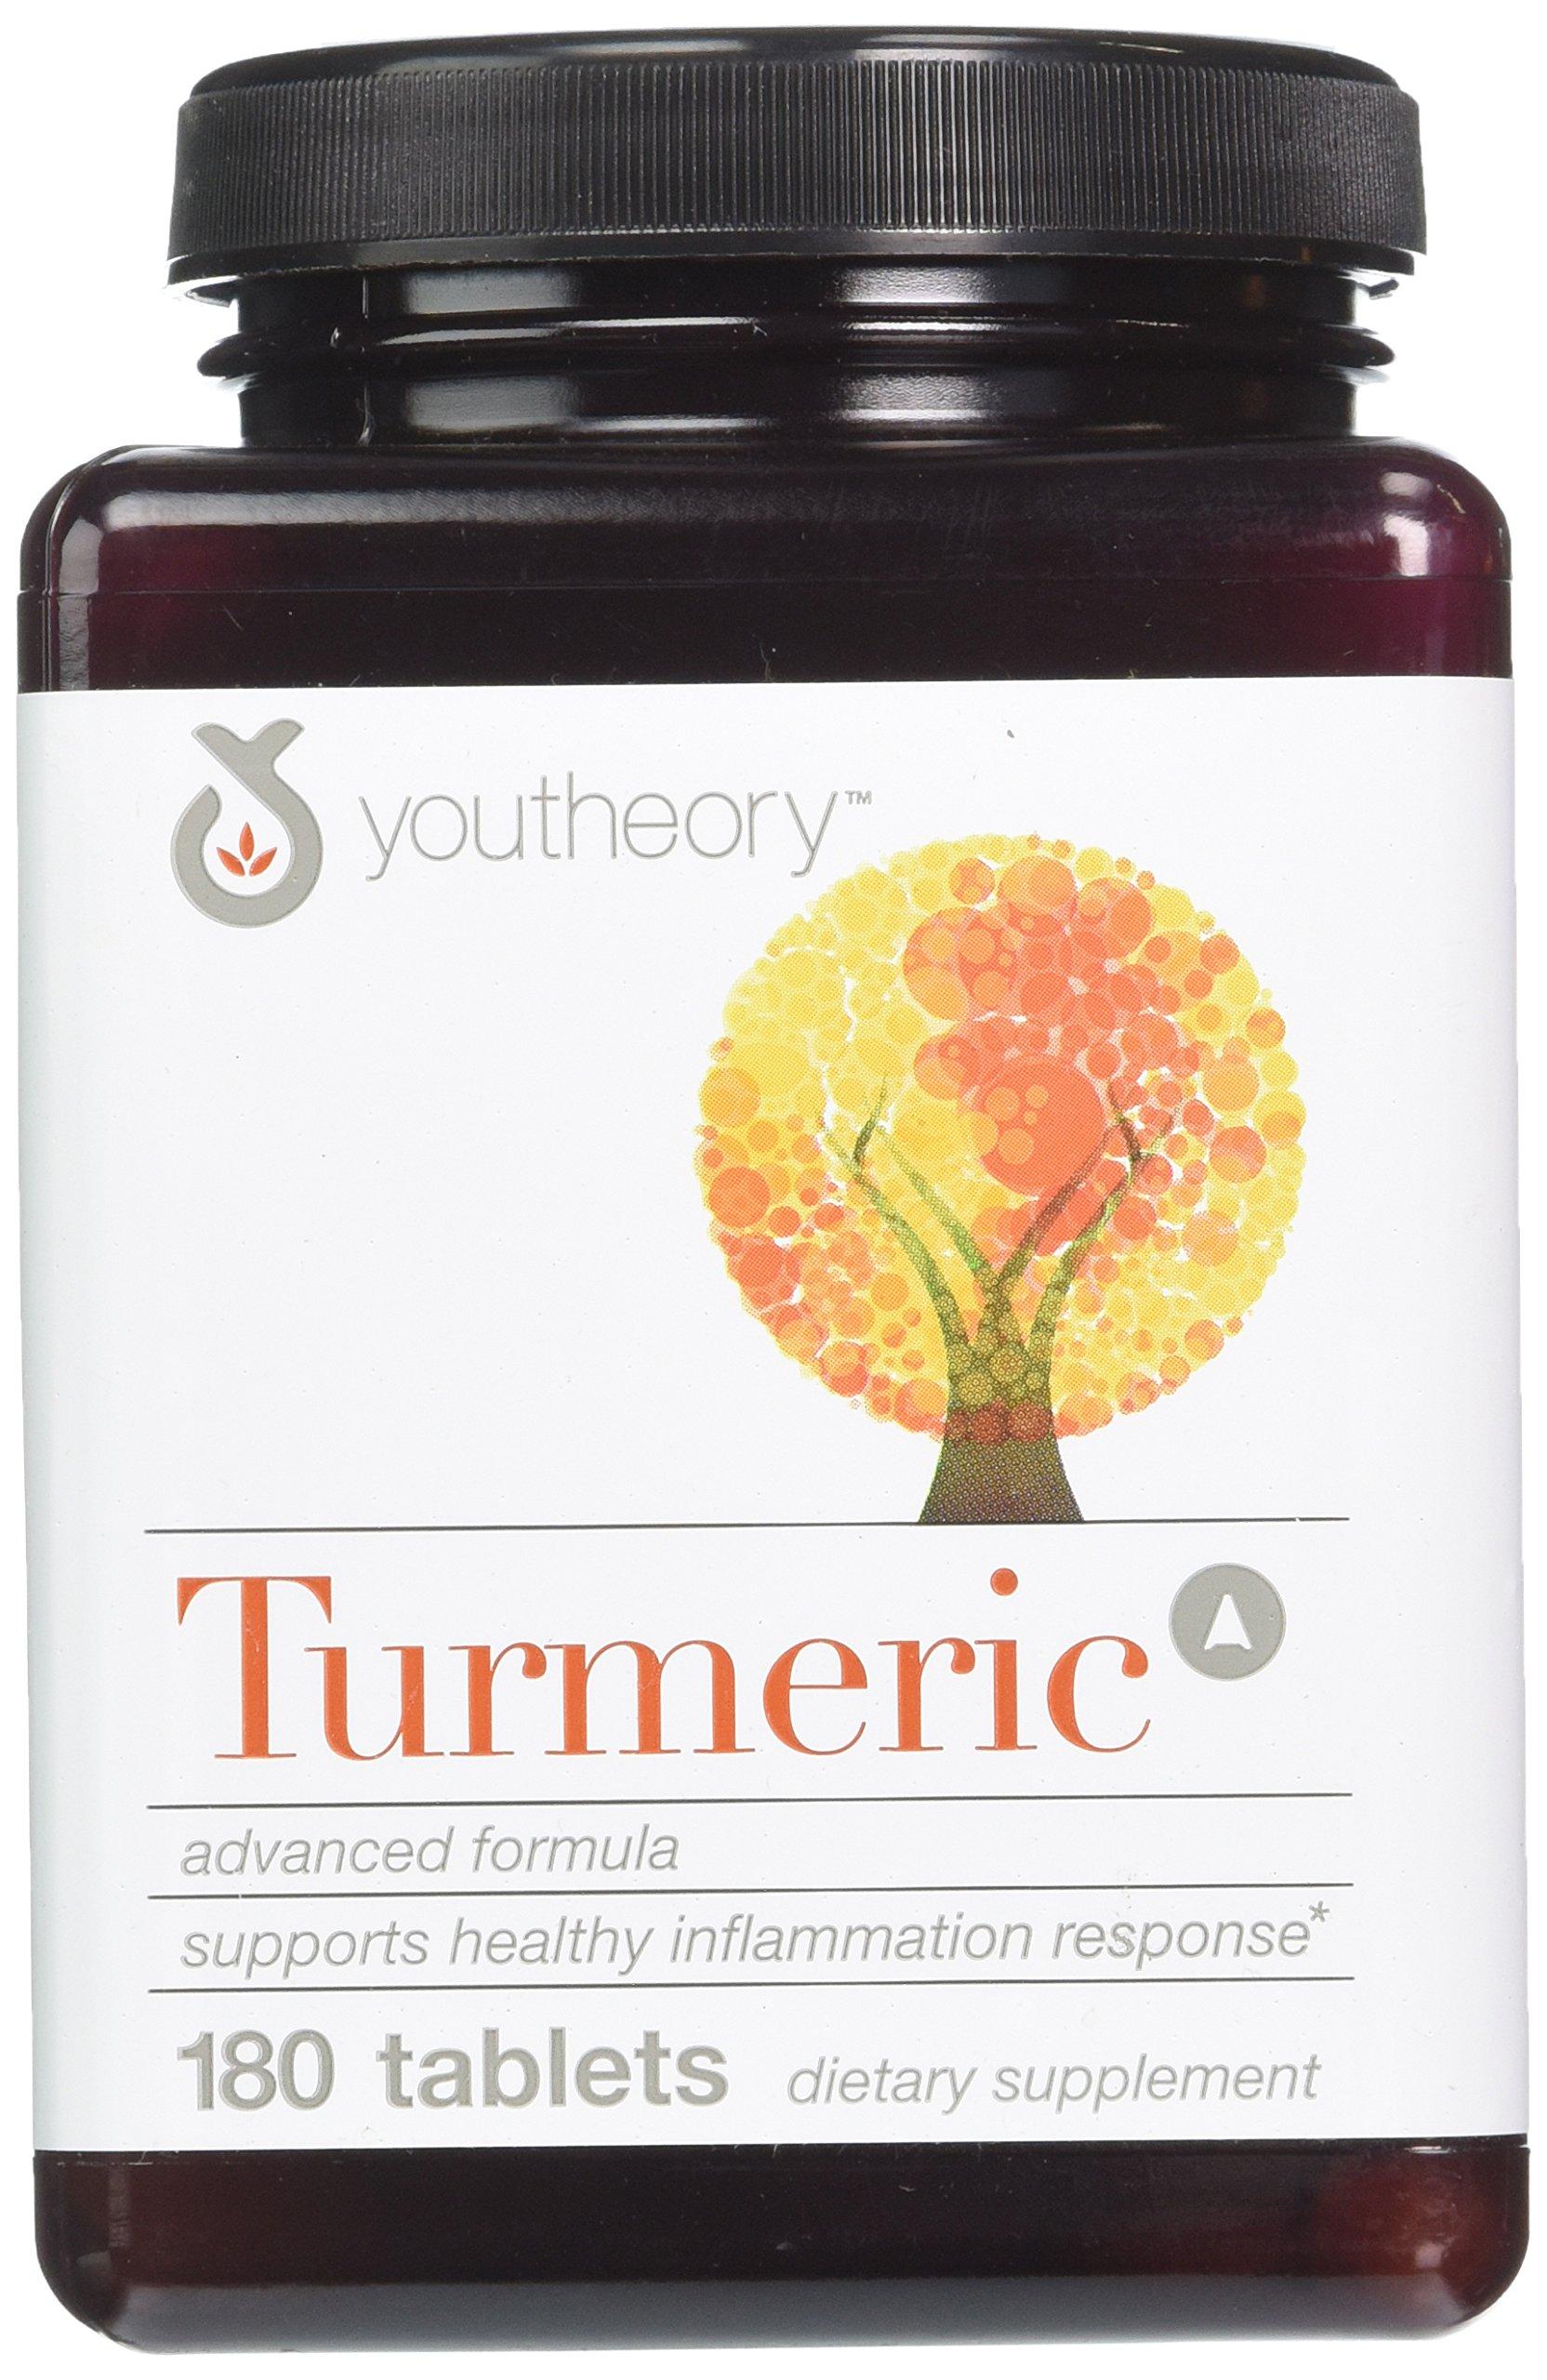 Youtheory Turmeric Advanced Formula Tablets - 180 ct